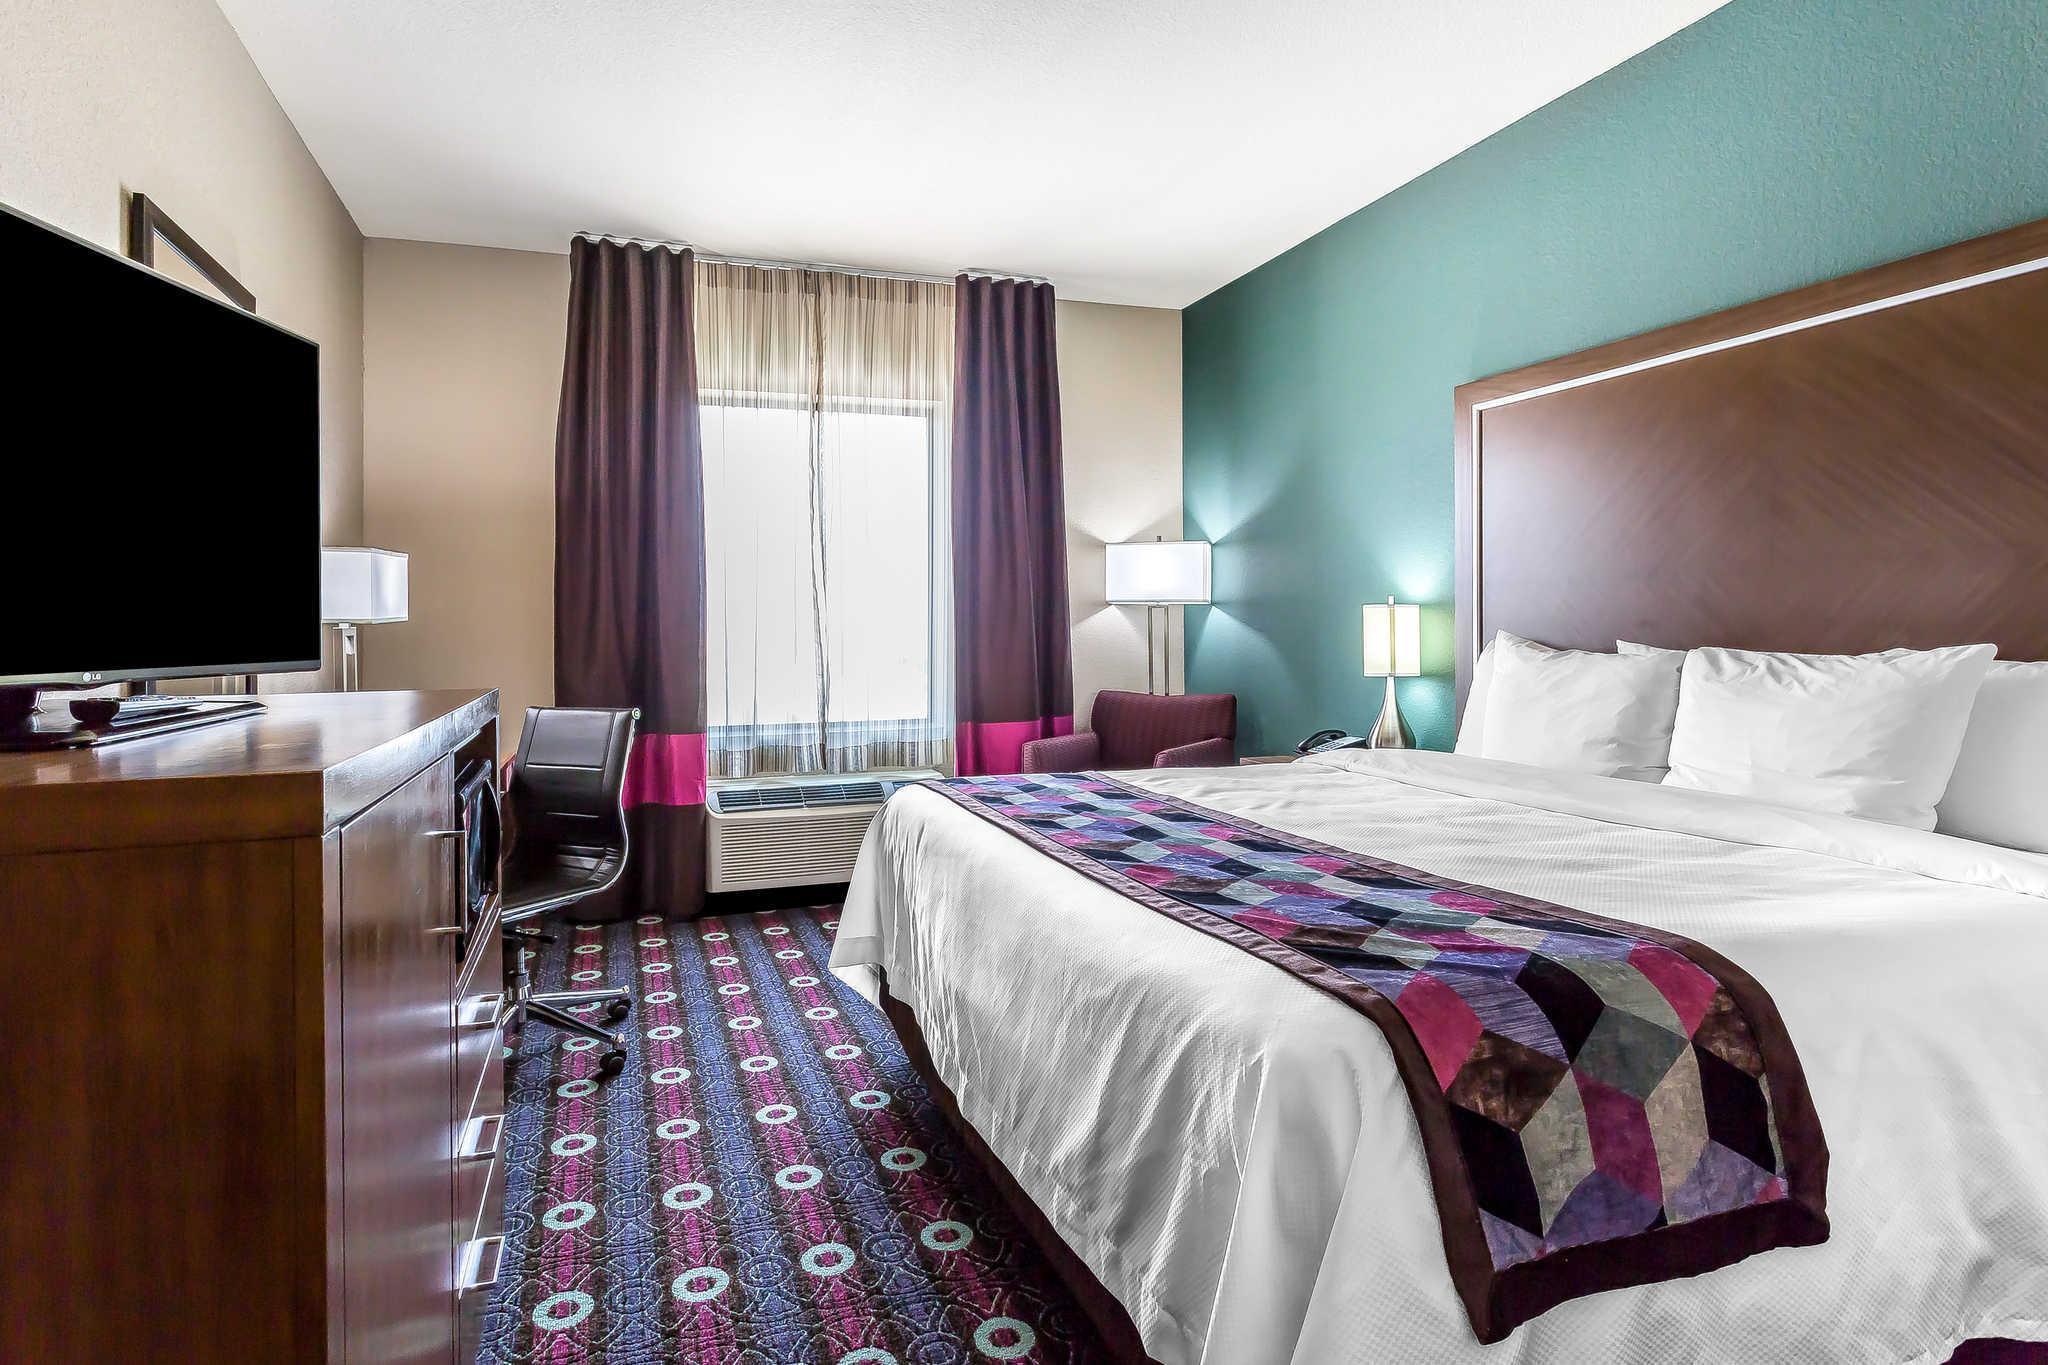 Comfort Inn & Suites Newcastle - Oklahoma City, McClain